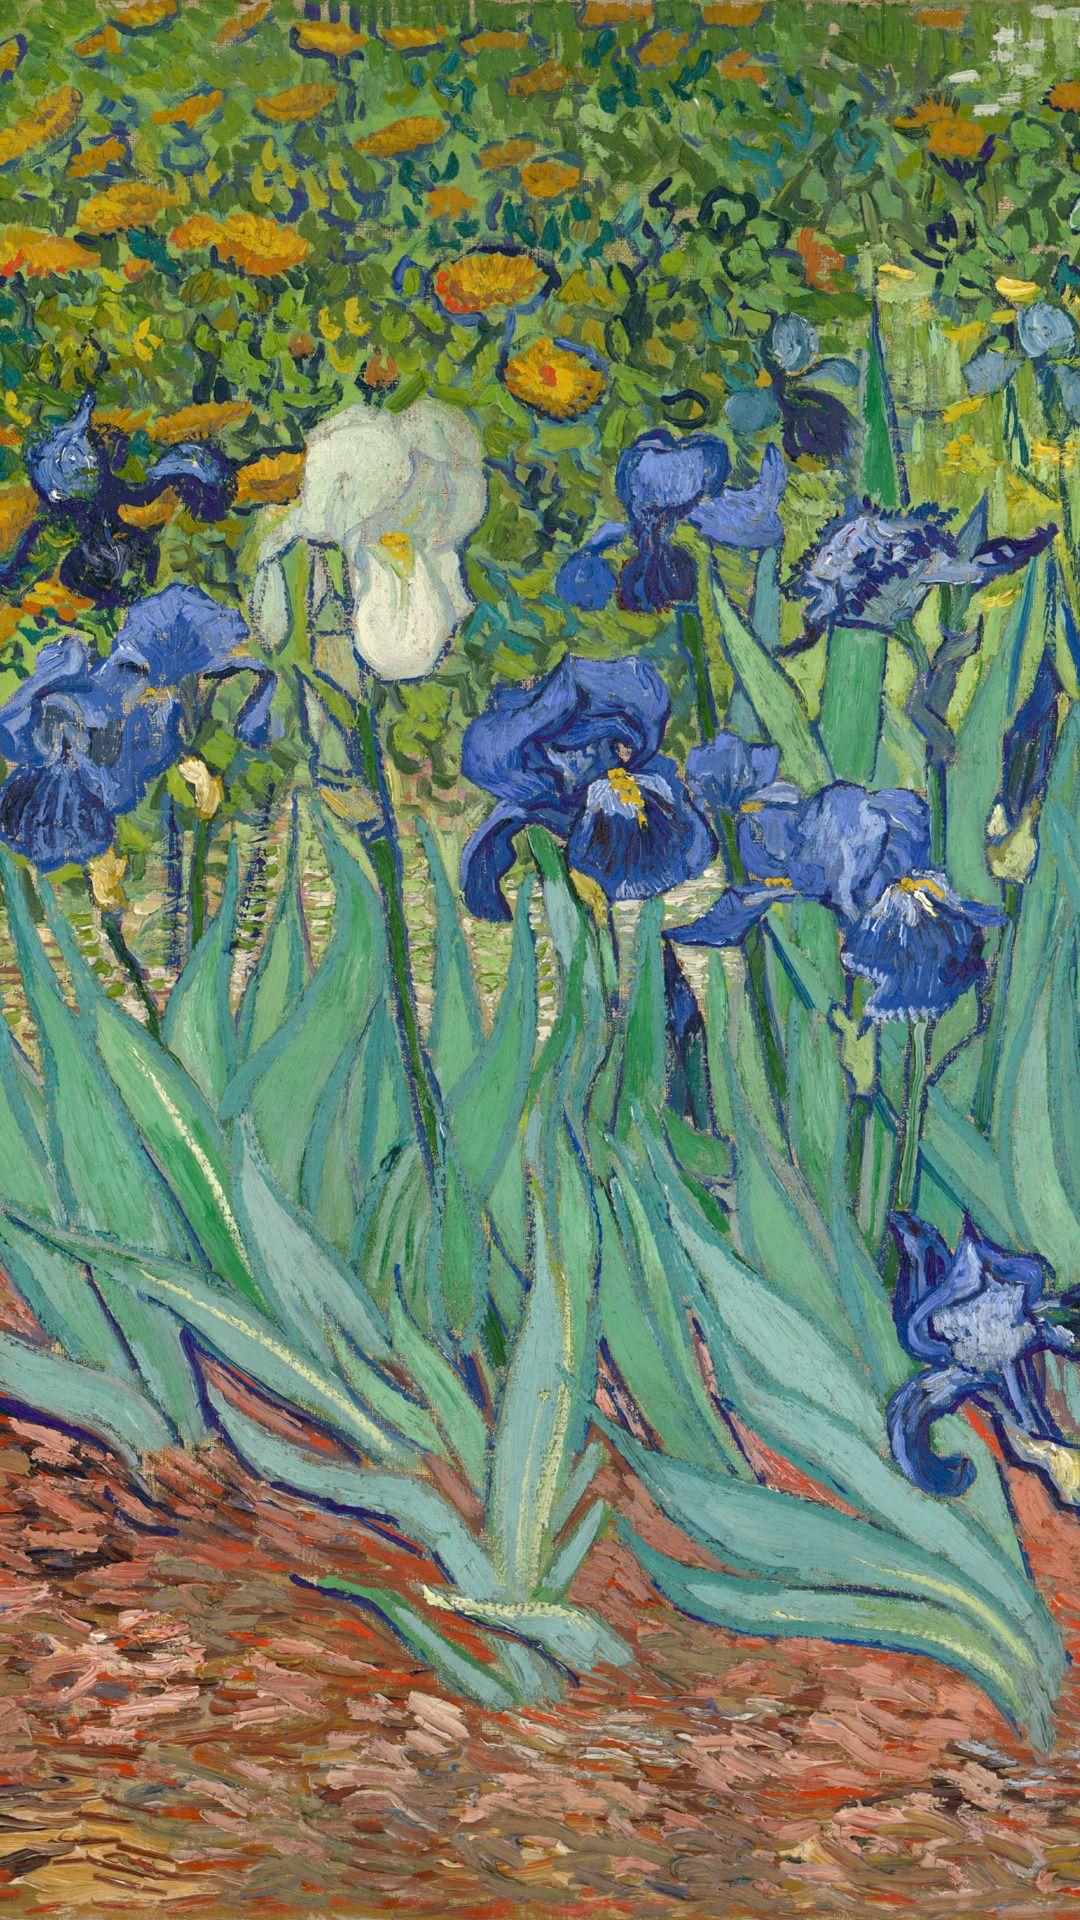 Vintage Hippie Wallpaper Download Van Gogh Wallpaper Van Gogh Irises Painting Wallpaper